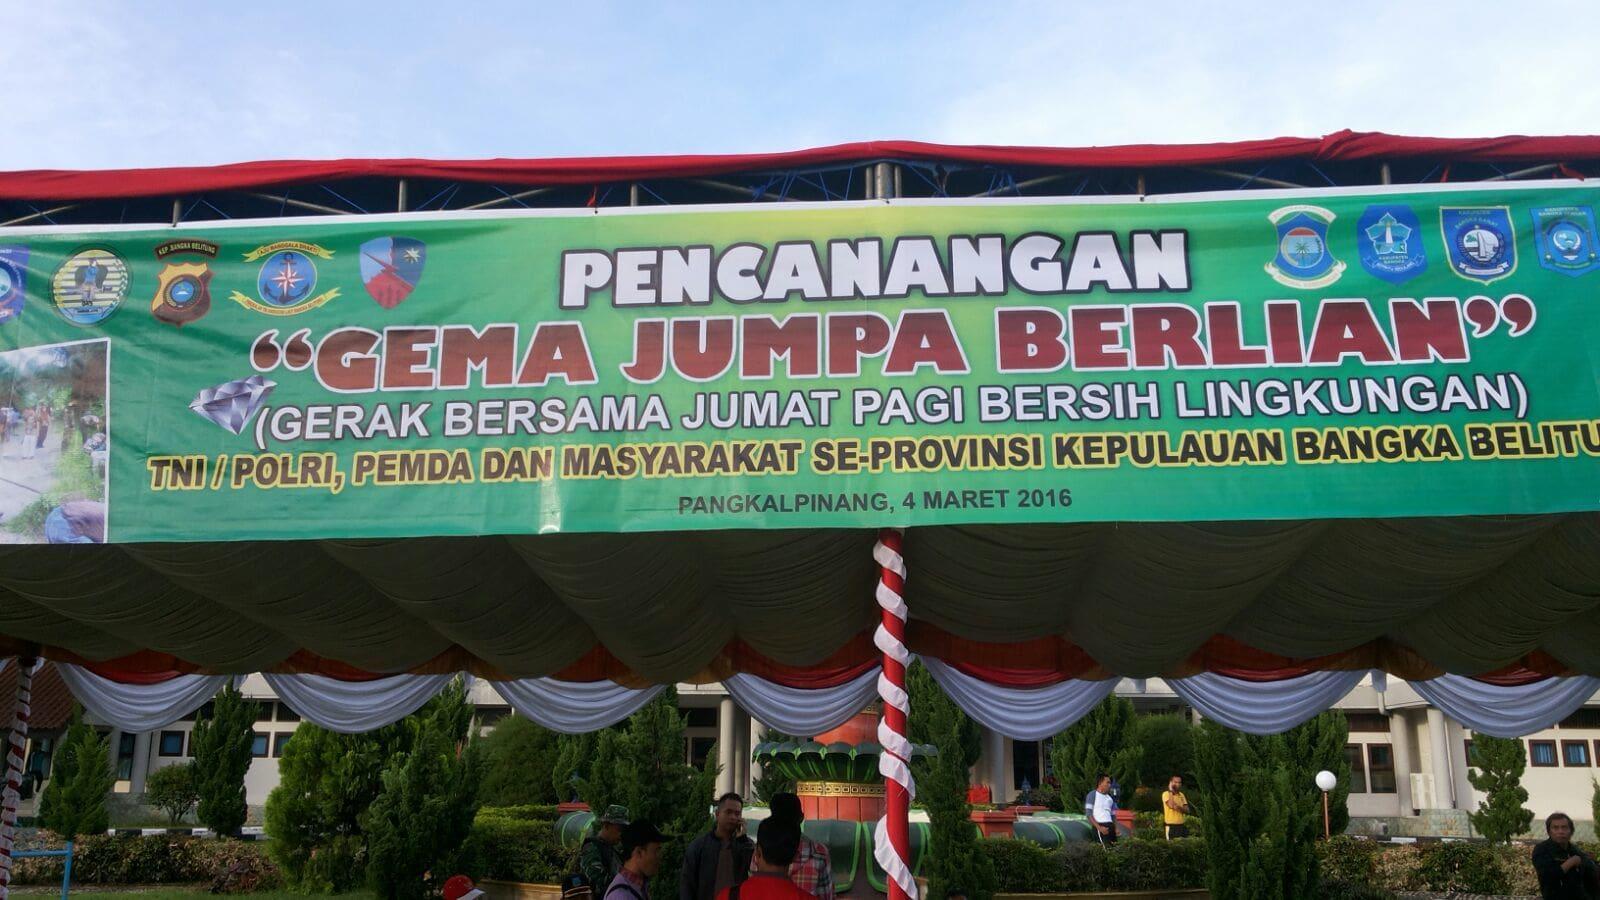 Gong Gema Berlian Resmi Ditabuh Di Bangka Belitung